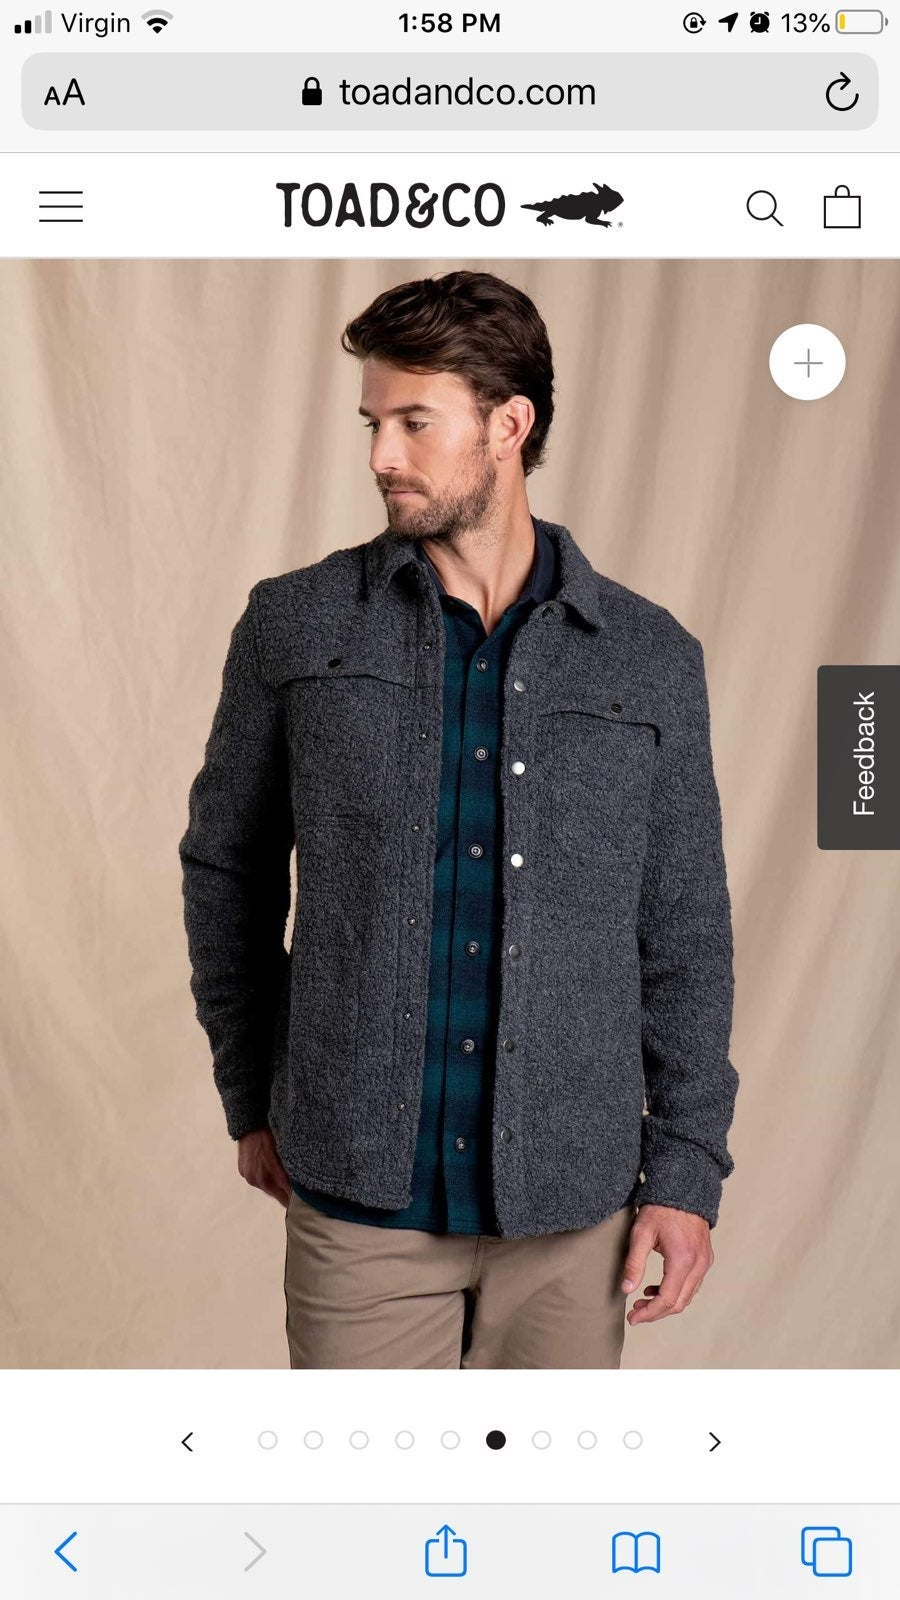 Toad & co telluride gray wool jacket